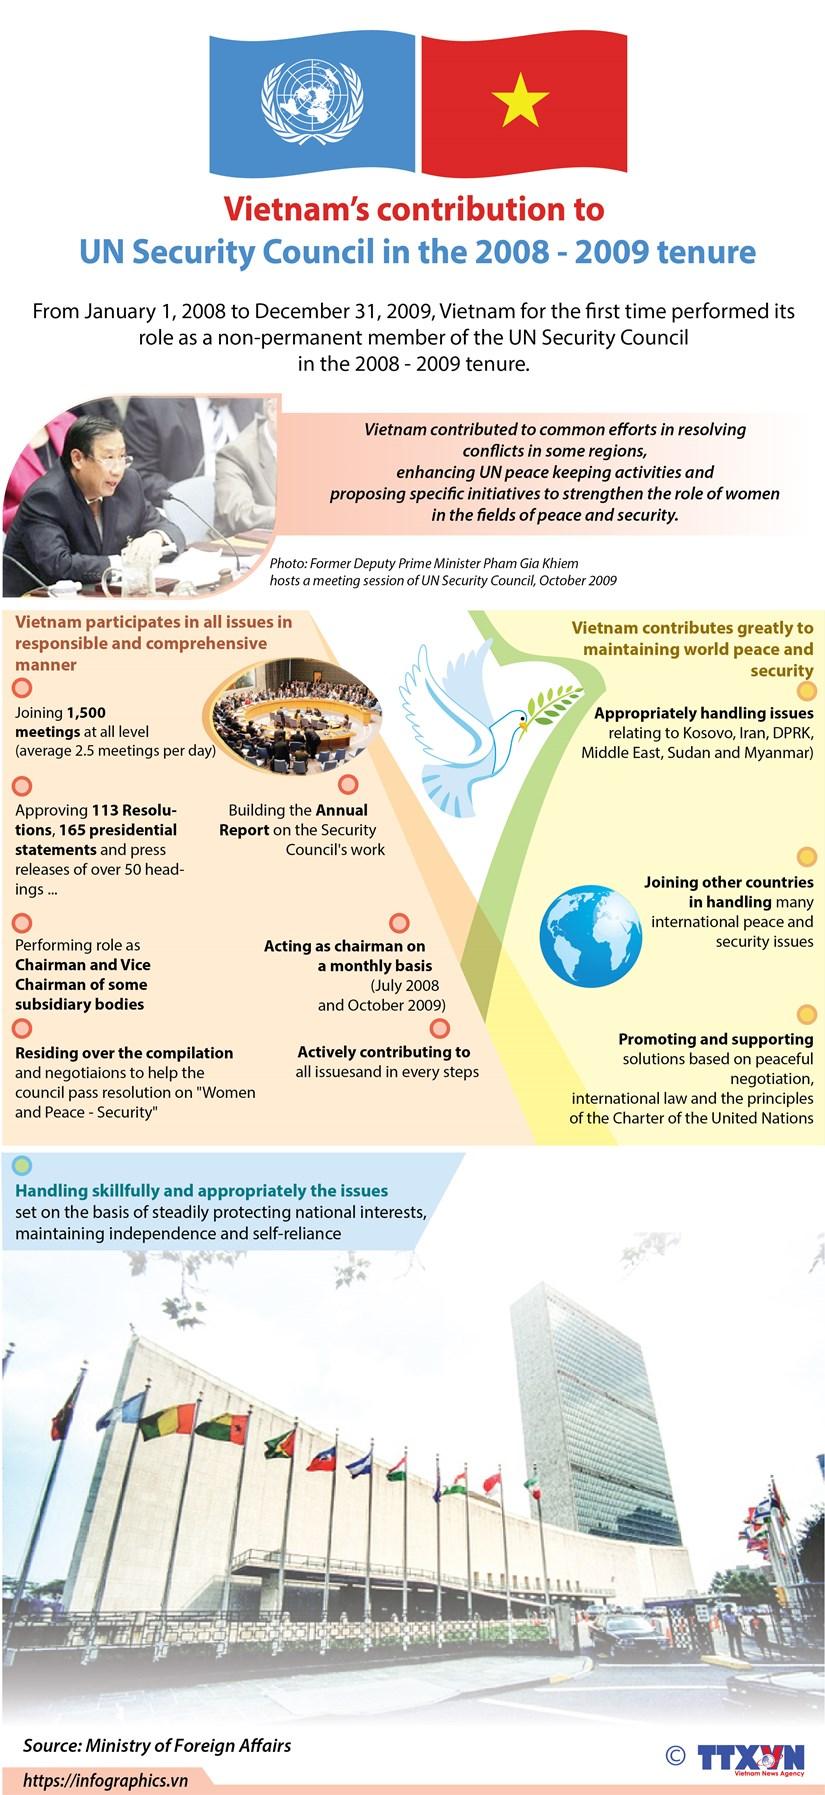 Vietnam actively contributes to UN Security Council hinh anh 1